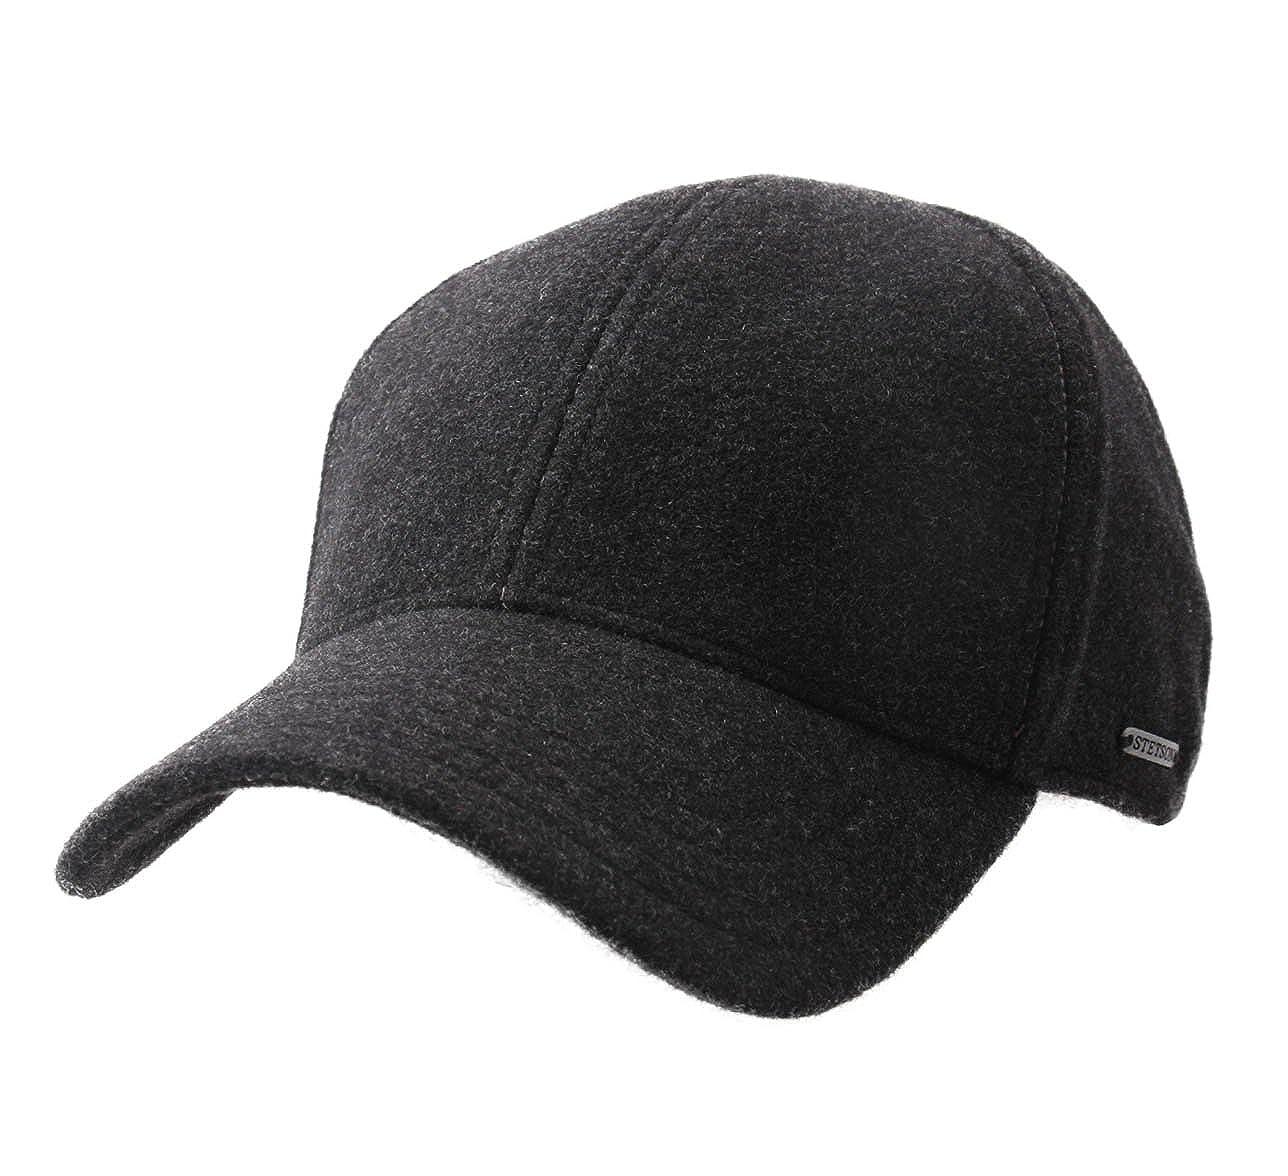 Stetson Men s Baseball Cap Lined Baseball Cap Size M at Amazon Men s  Clothing store  266ca58ed24